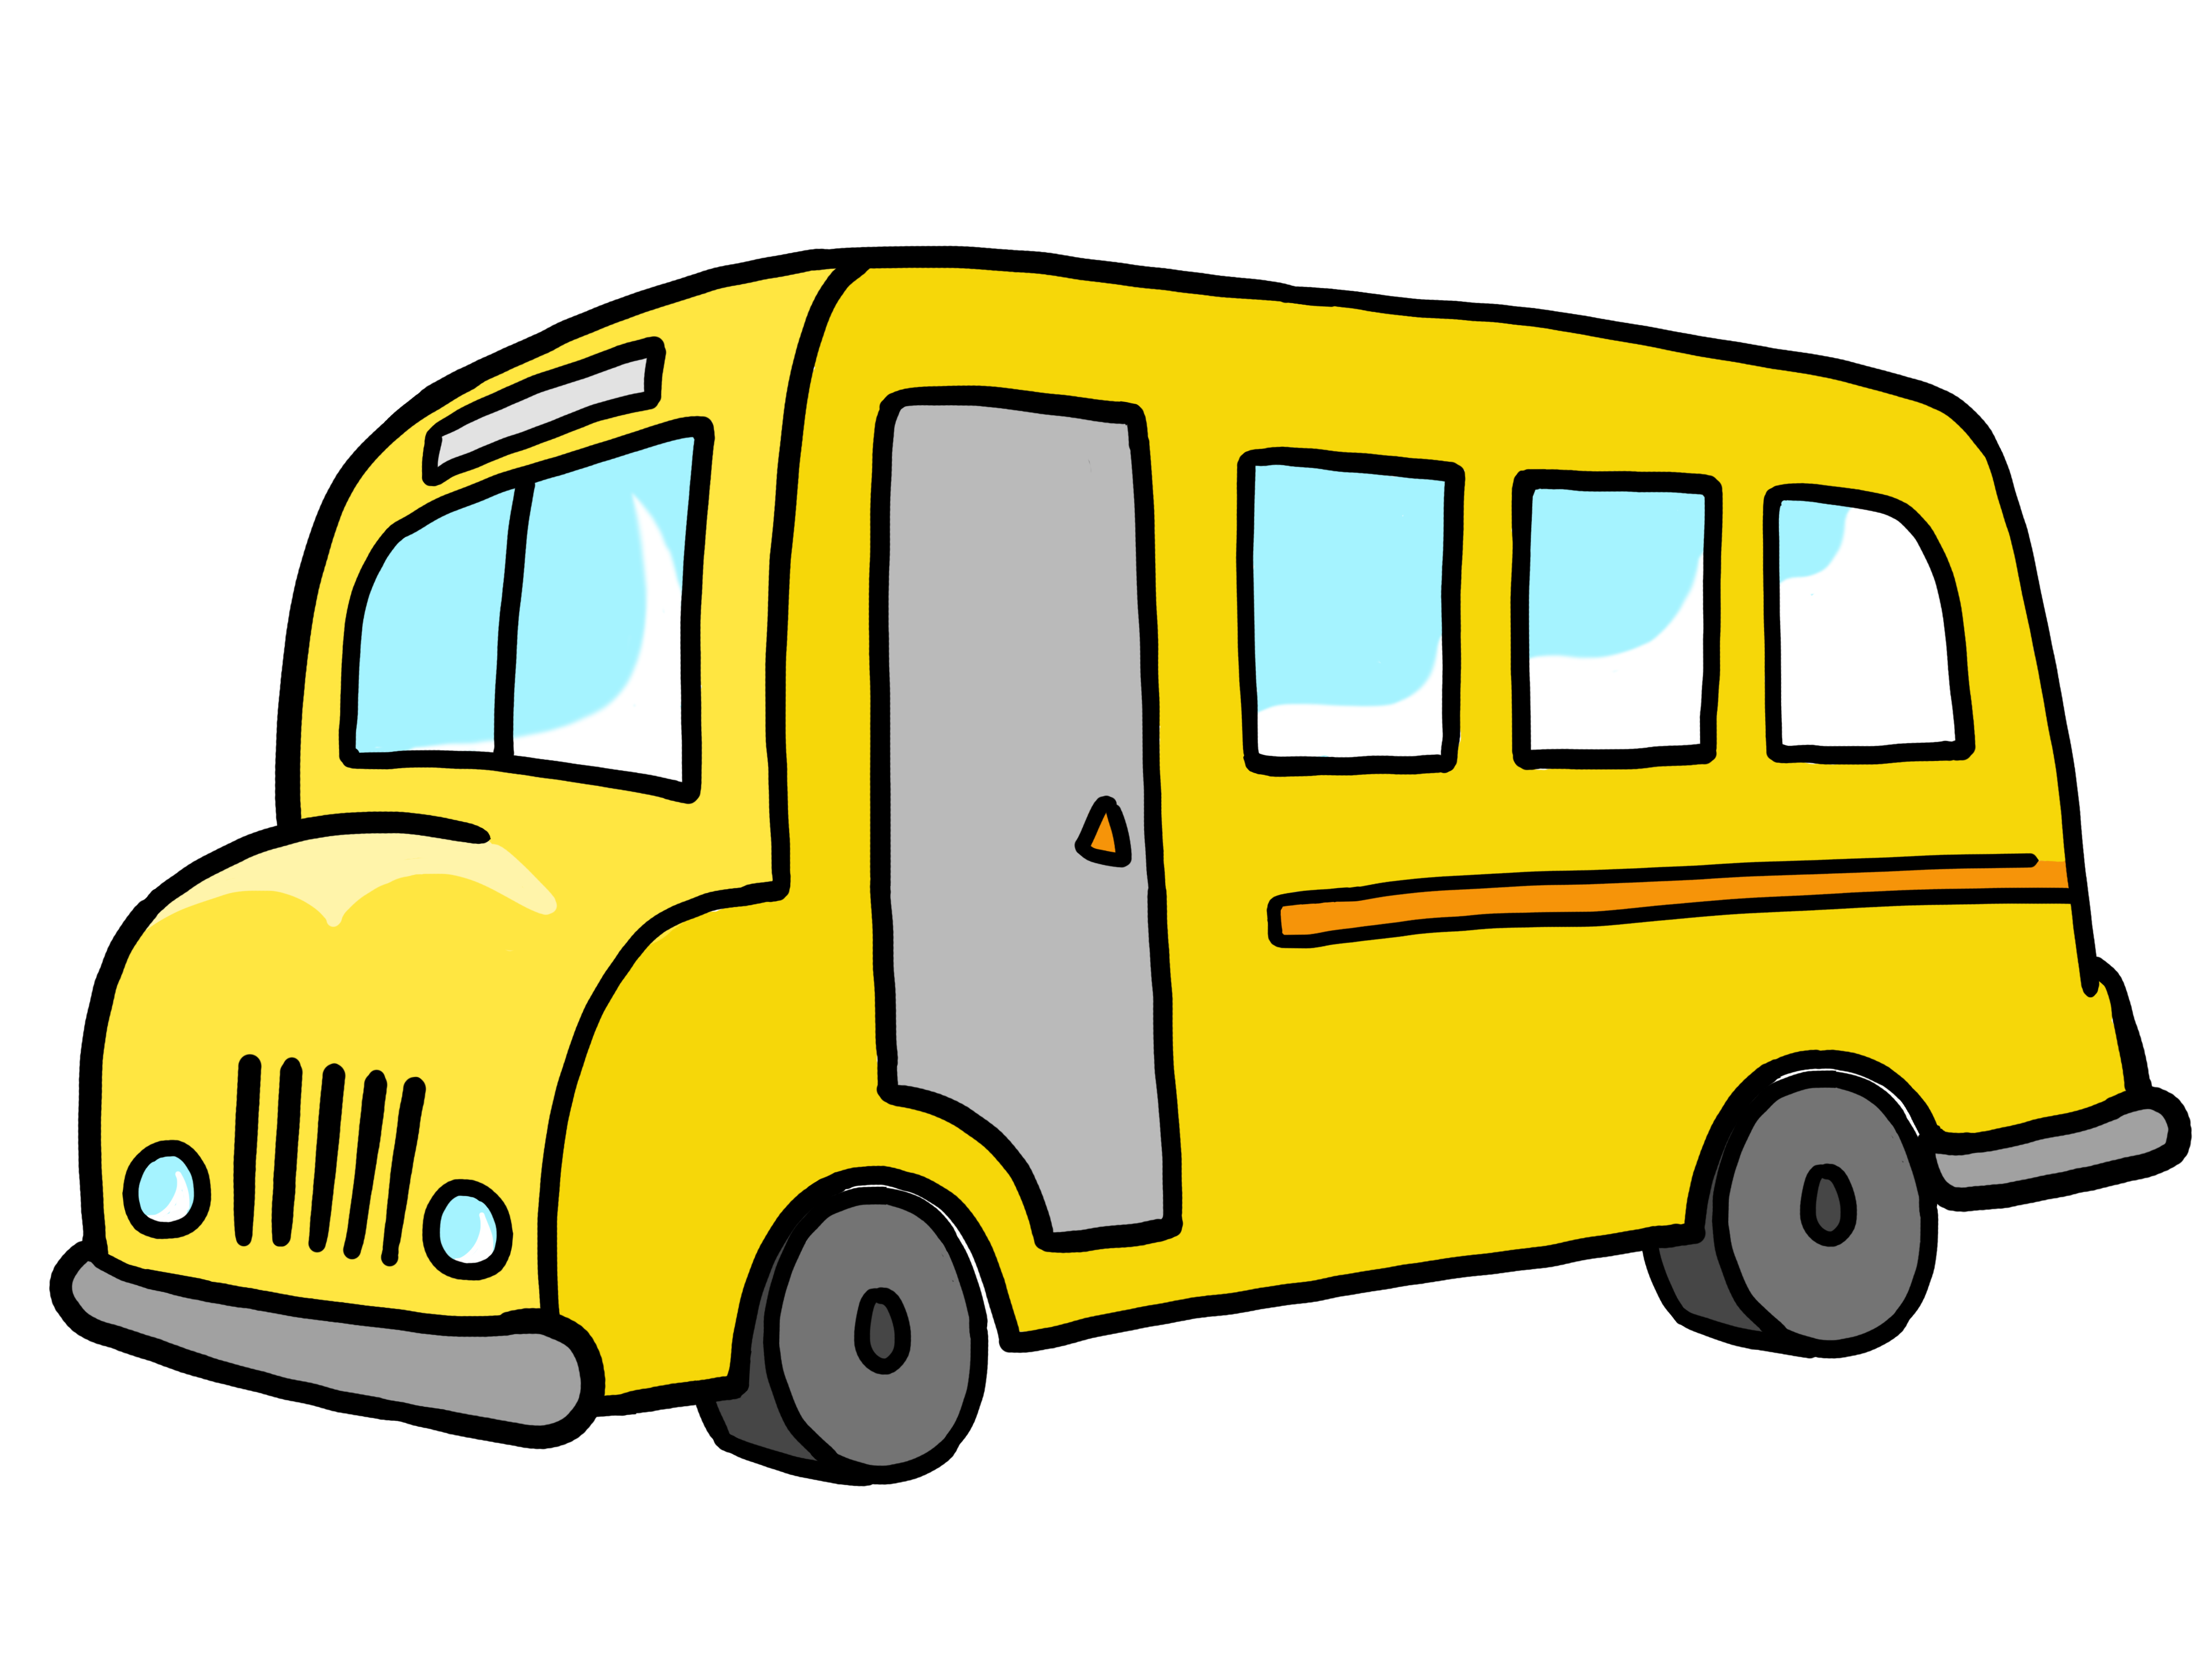 Clipart shuttle bus picture stock School bus under the bus clipart - WikiClipArt picture stock